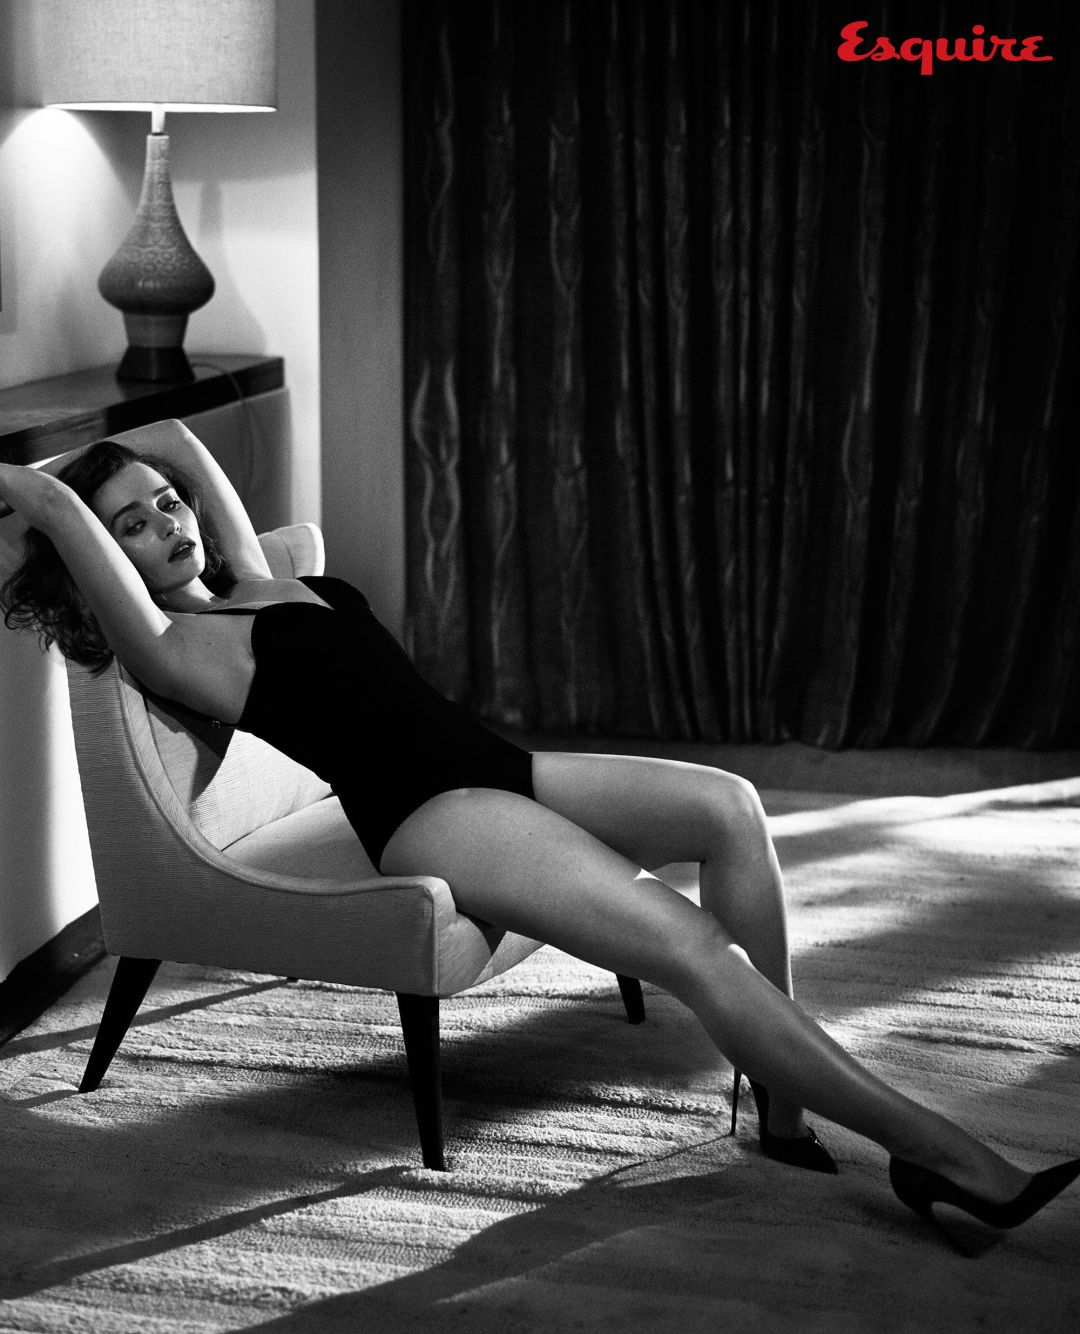 HIGH RES Esquire emilia-clarke-sexiest-woman-alive-2015 4